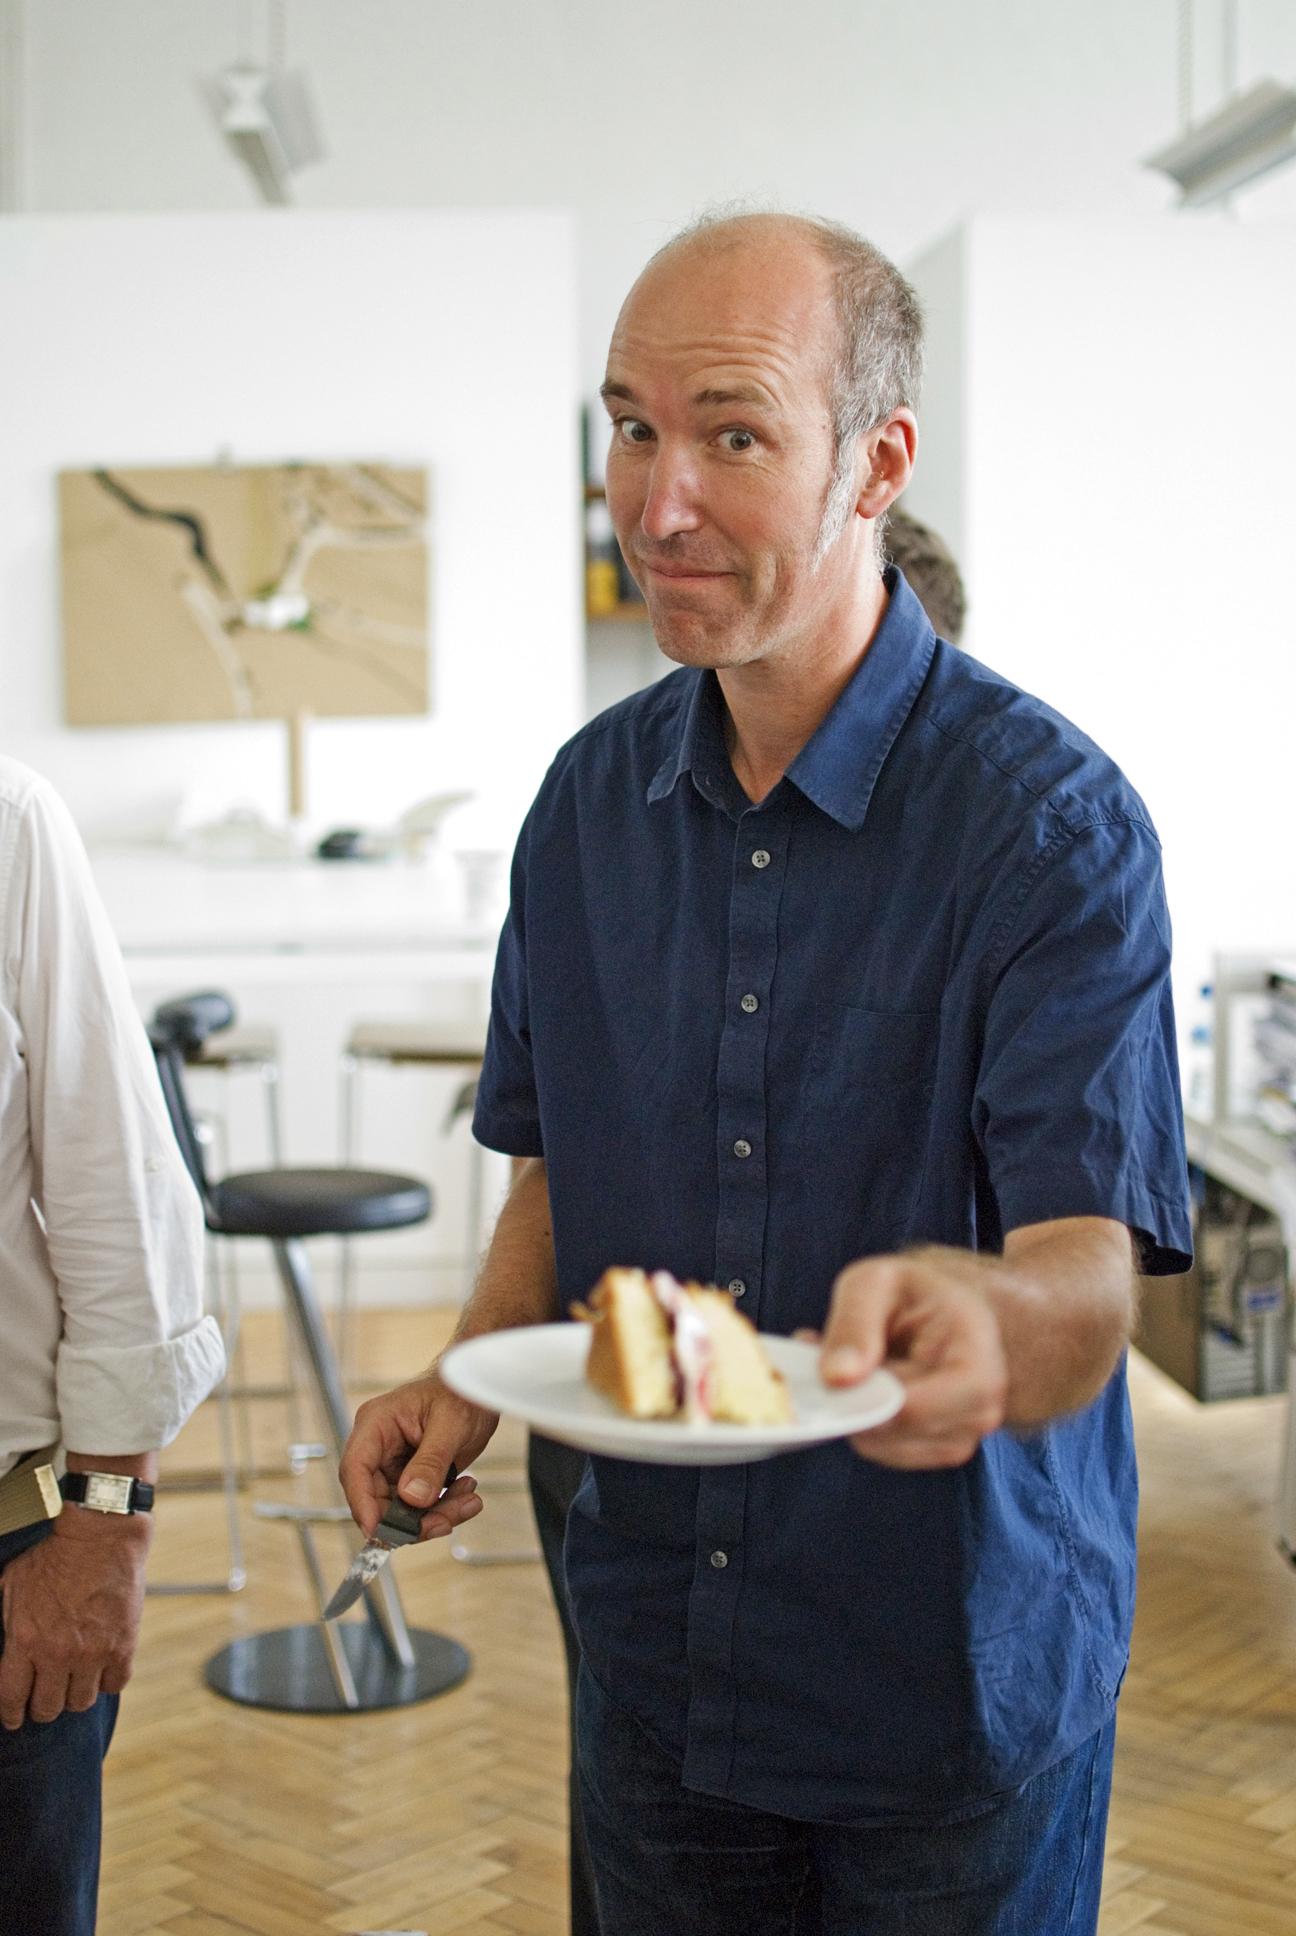 richard with cake.jpg